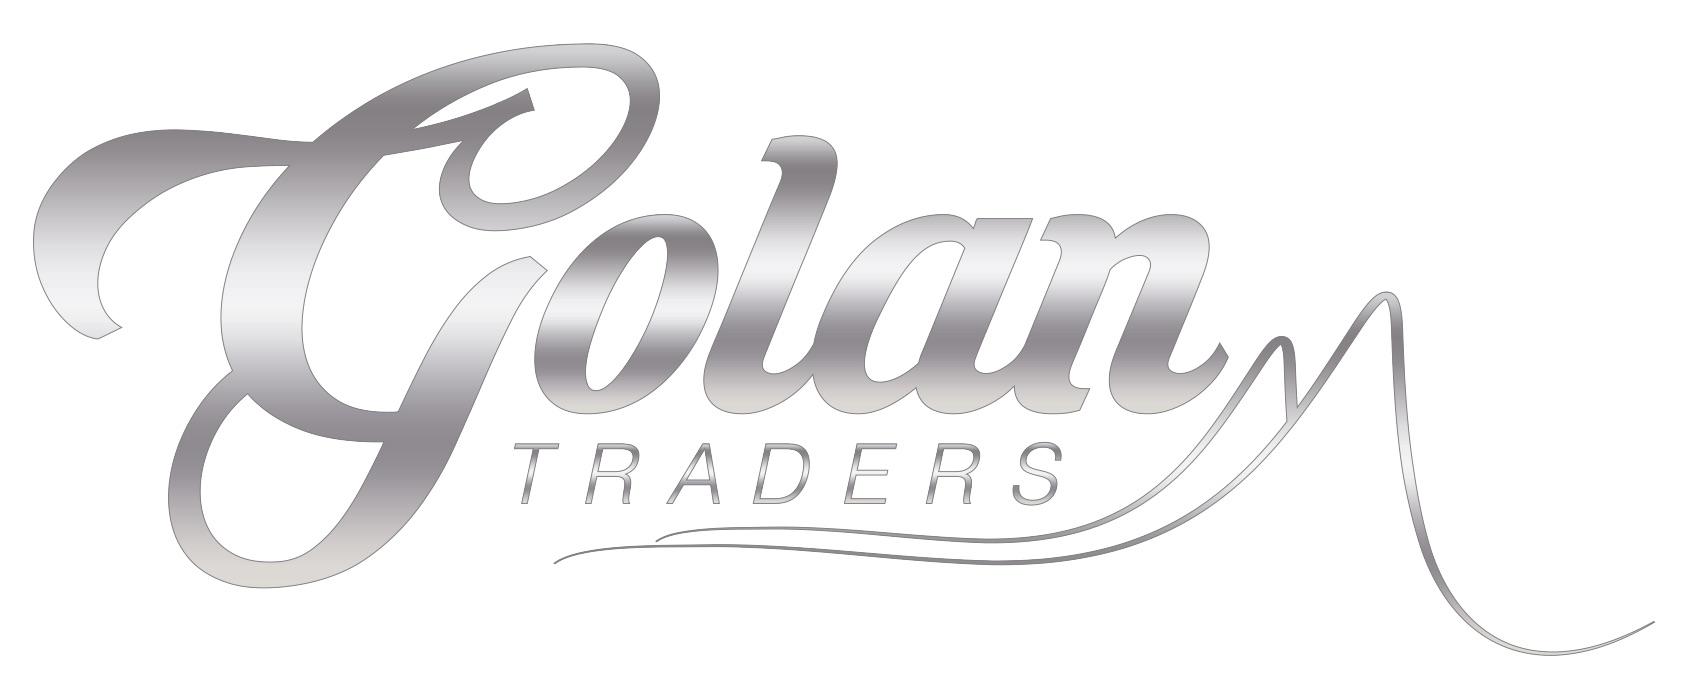 Golani Traders